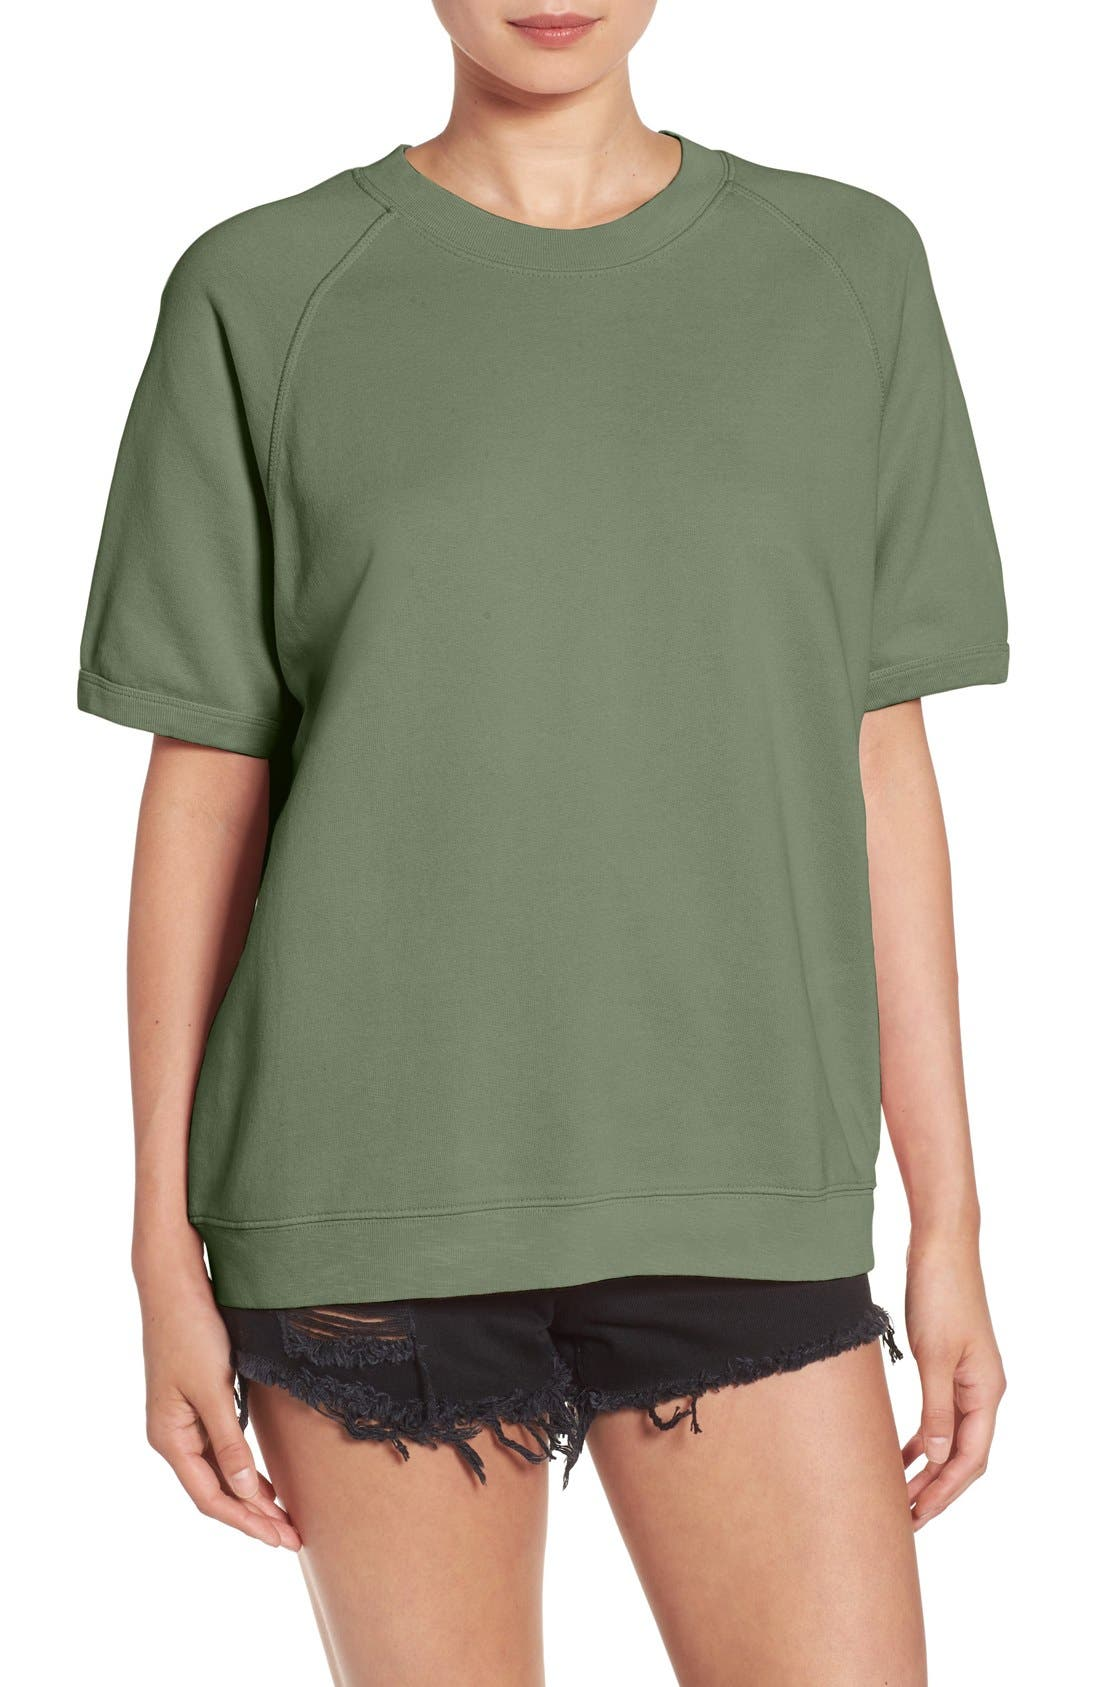 Alternate Image 1 Selected - Sincerely Jules 'Cara' Short Sleeve Sweatshirt